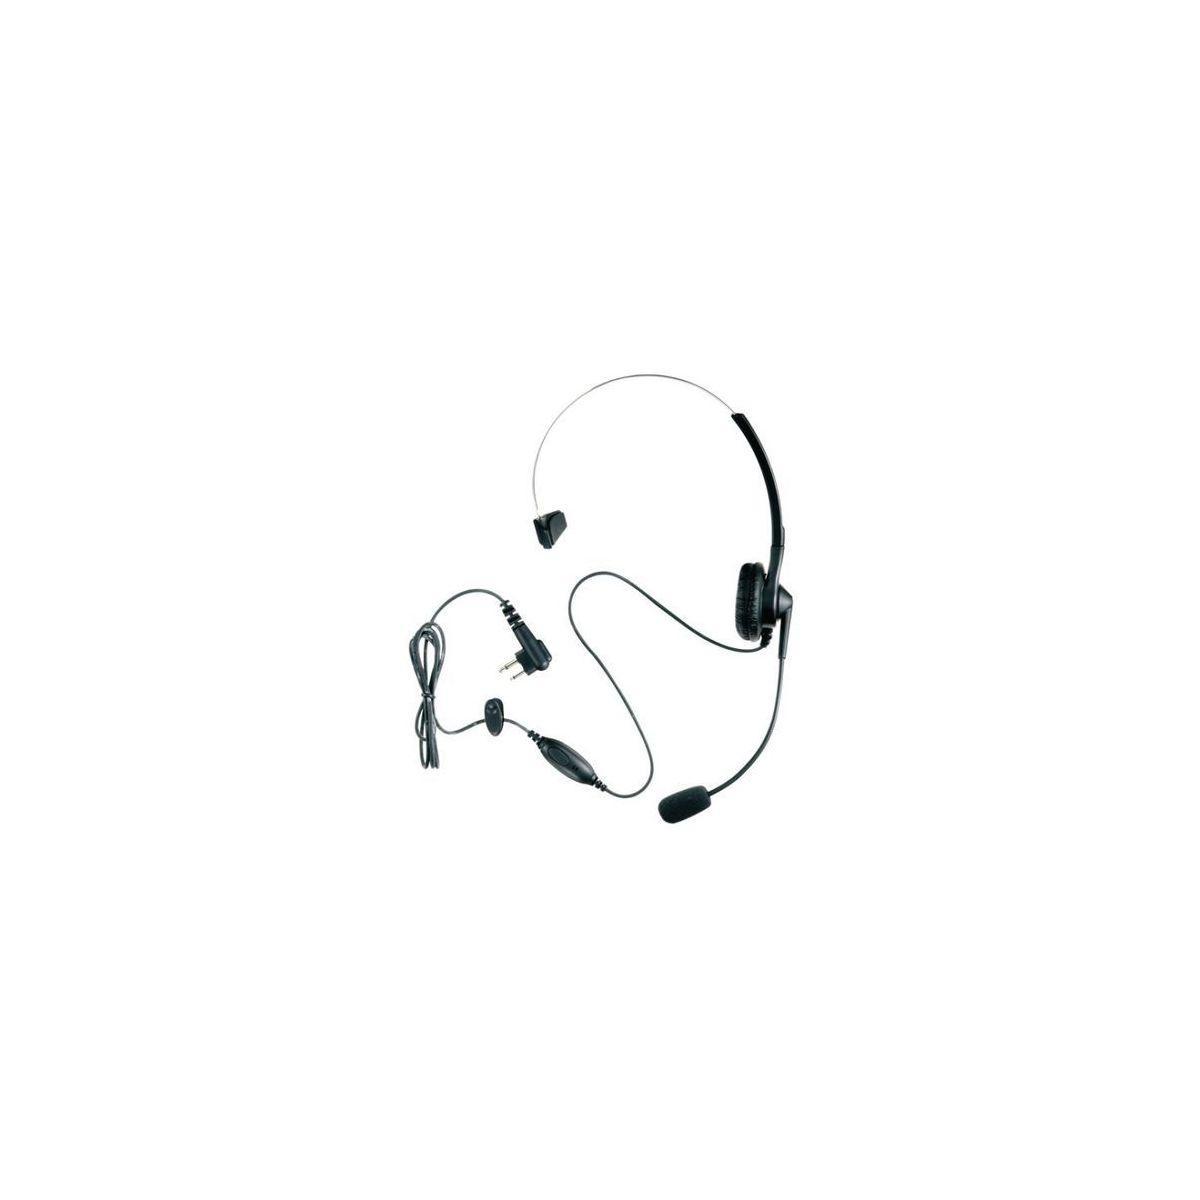 Casque micro t�l�phone fixe motorola l�ger avec microtige avec ntn9159 00168 - 2% de remise imm�diate avec le code : priv2 (photo)